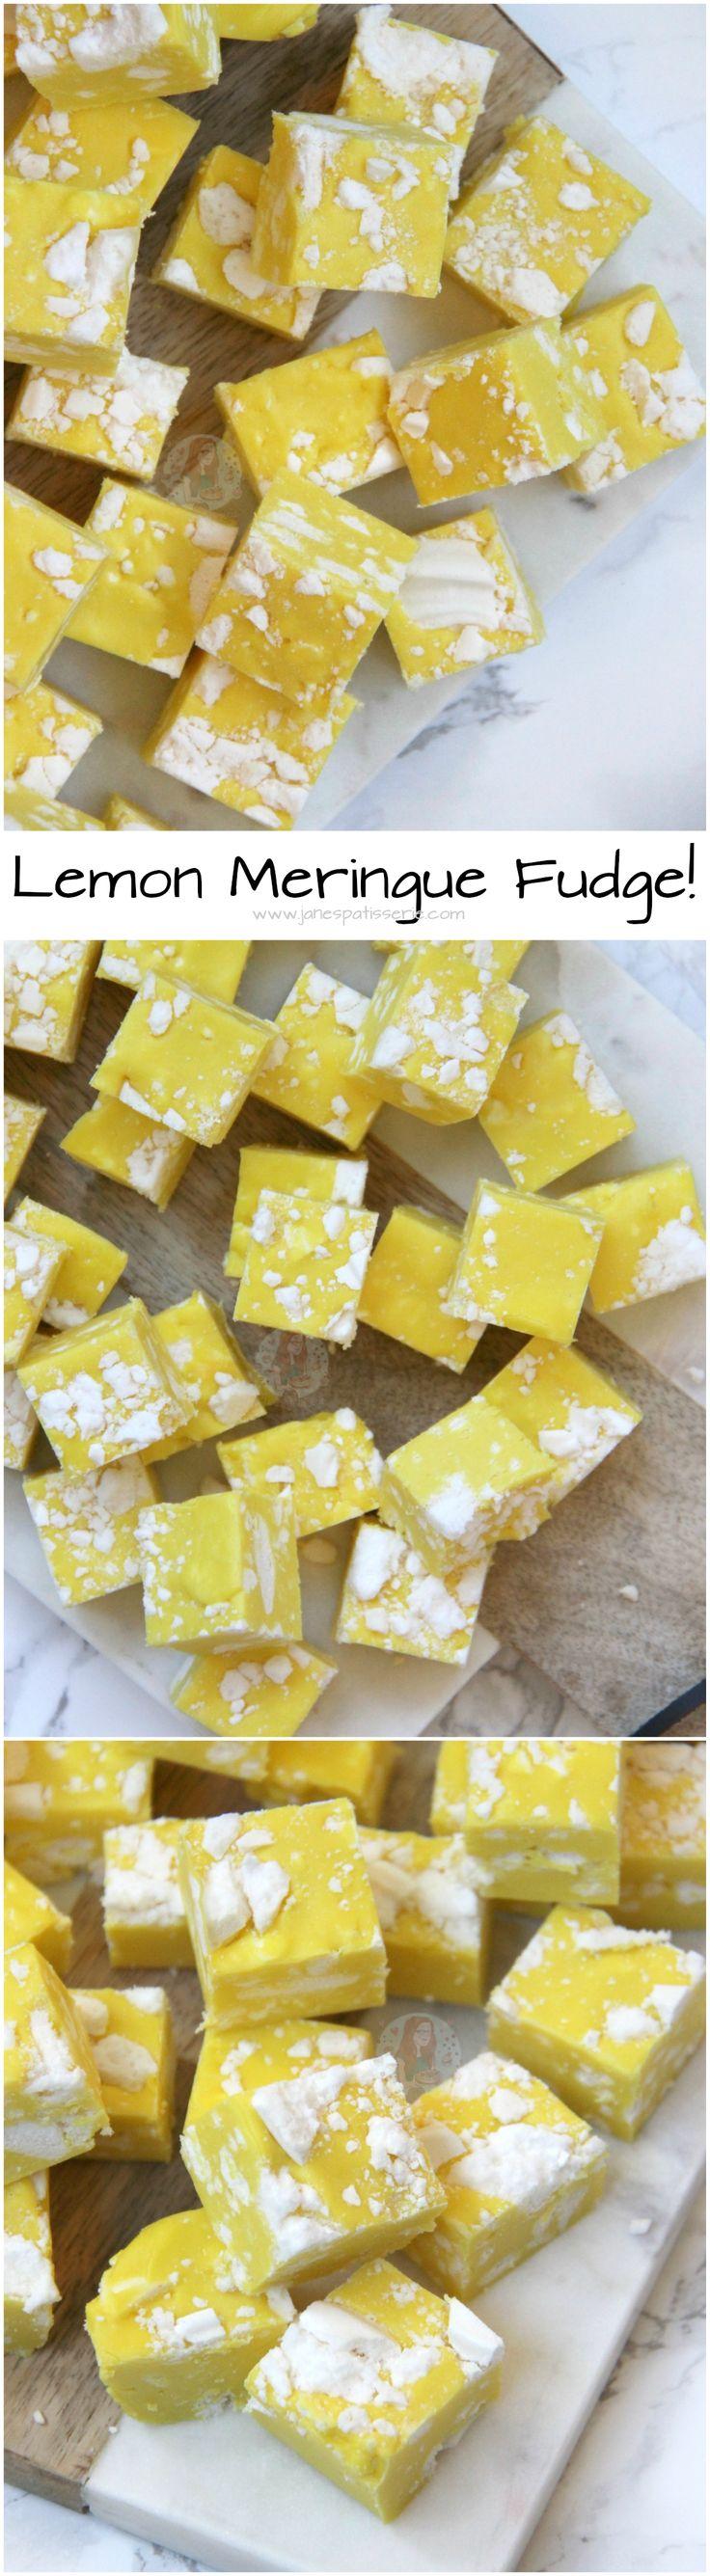 Lemon Meringue Fudge! ❤️ Easy Condensed Milk Lemon Fudge with Crunchy & Sweet Meringue pieces!